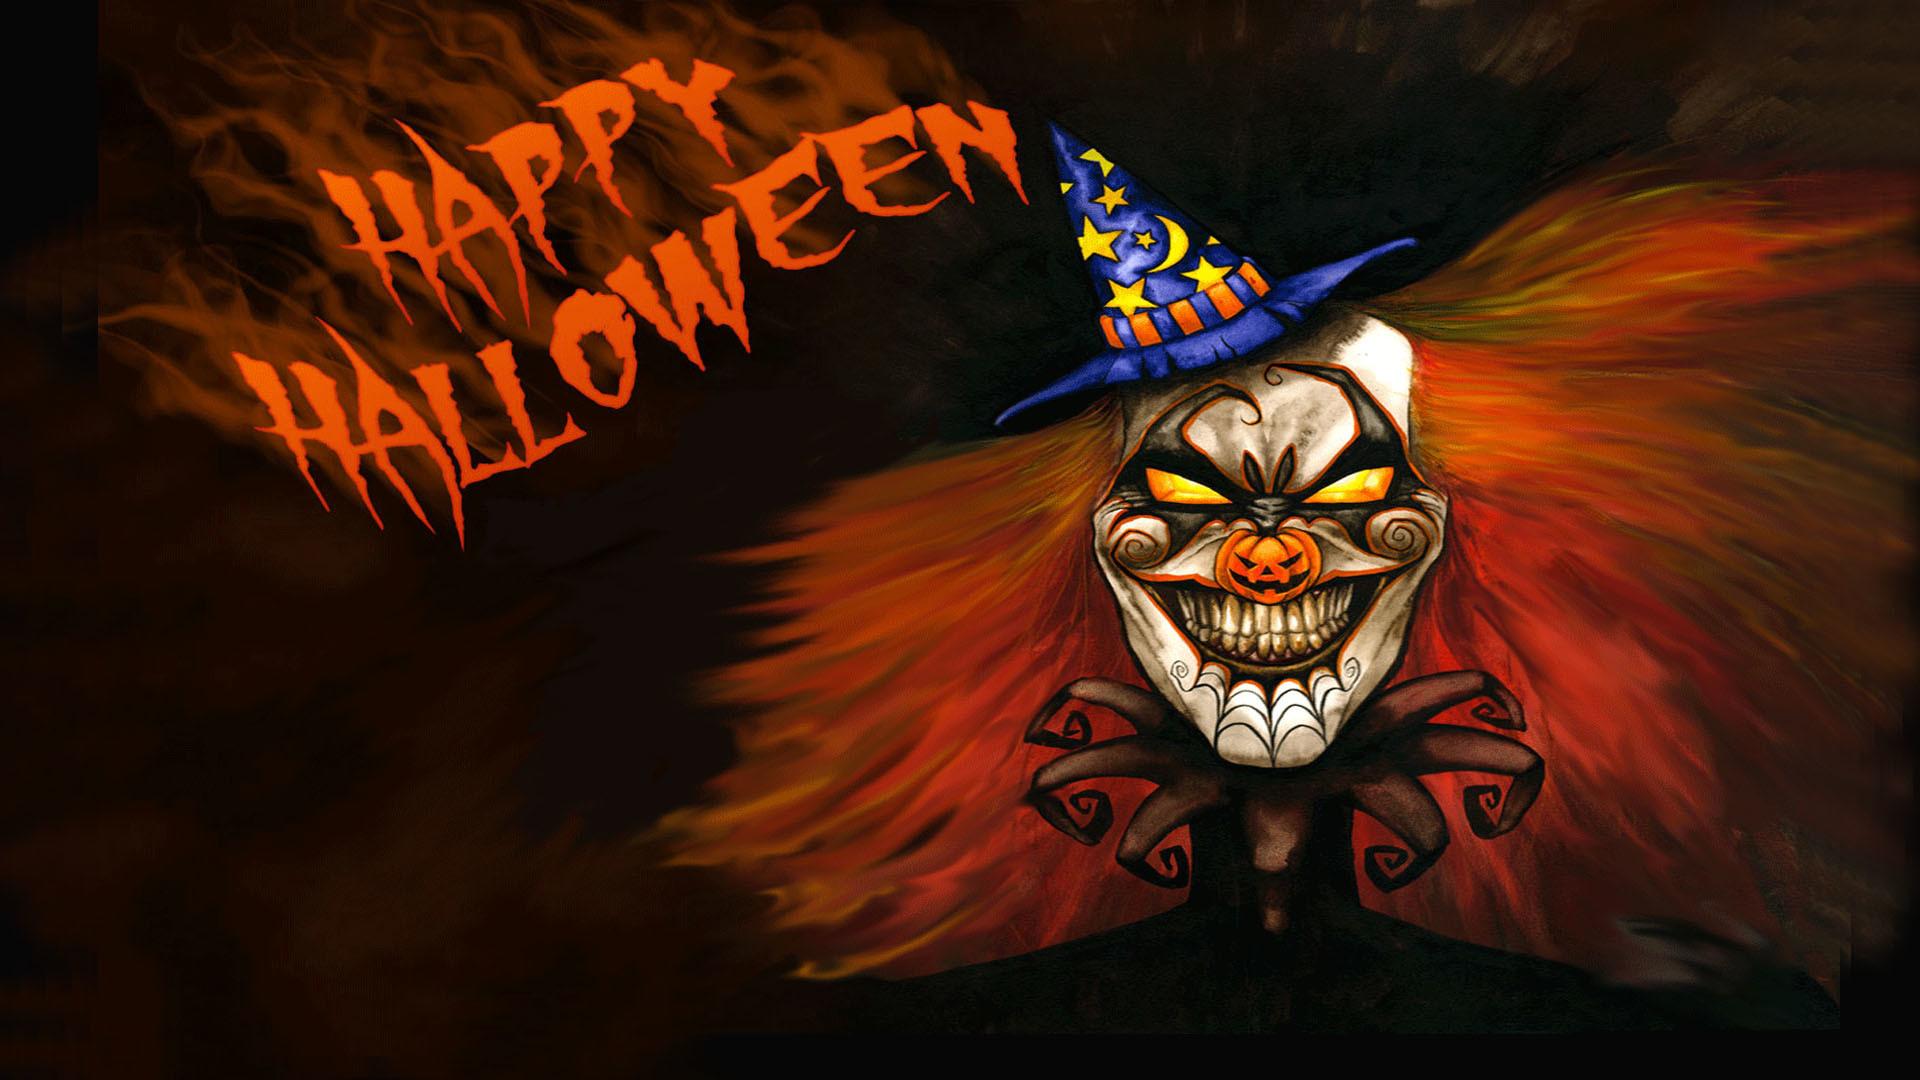 Halloween wallpapers HD free download.